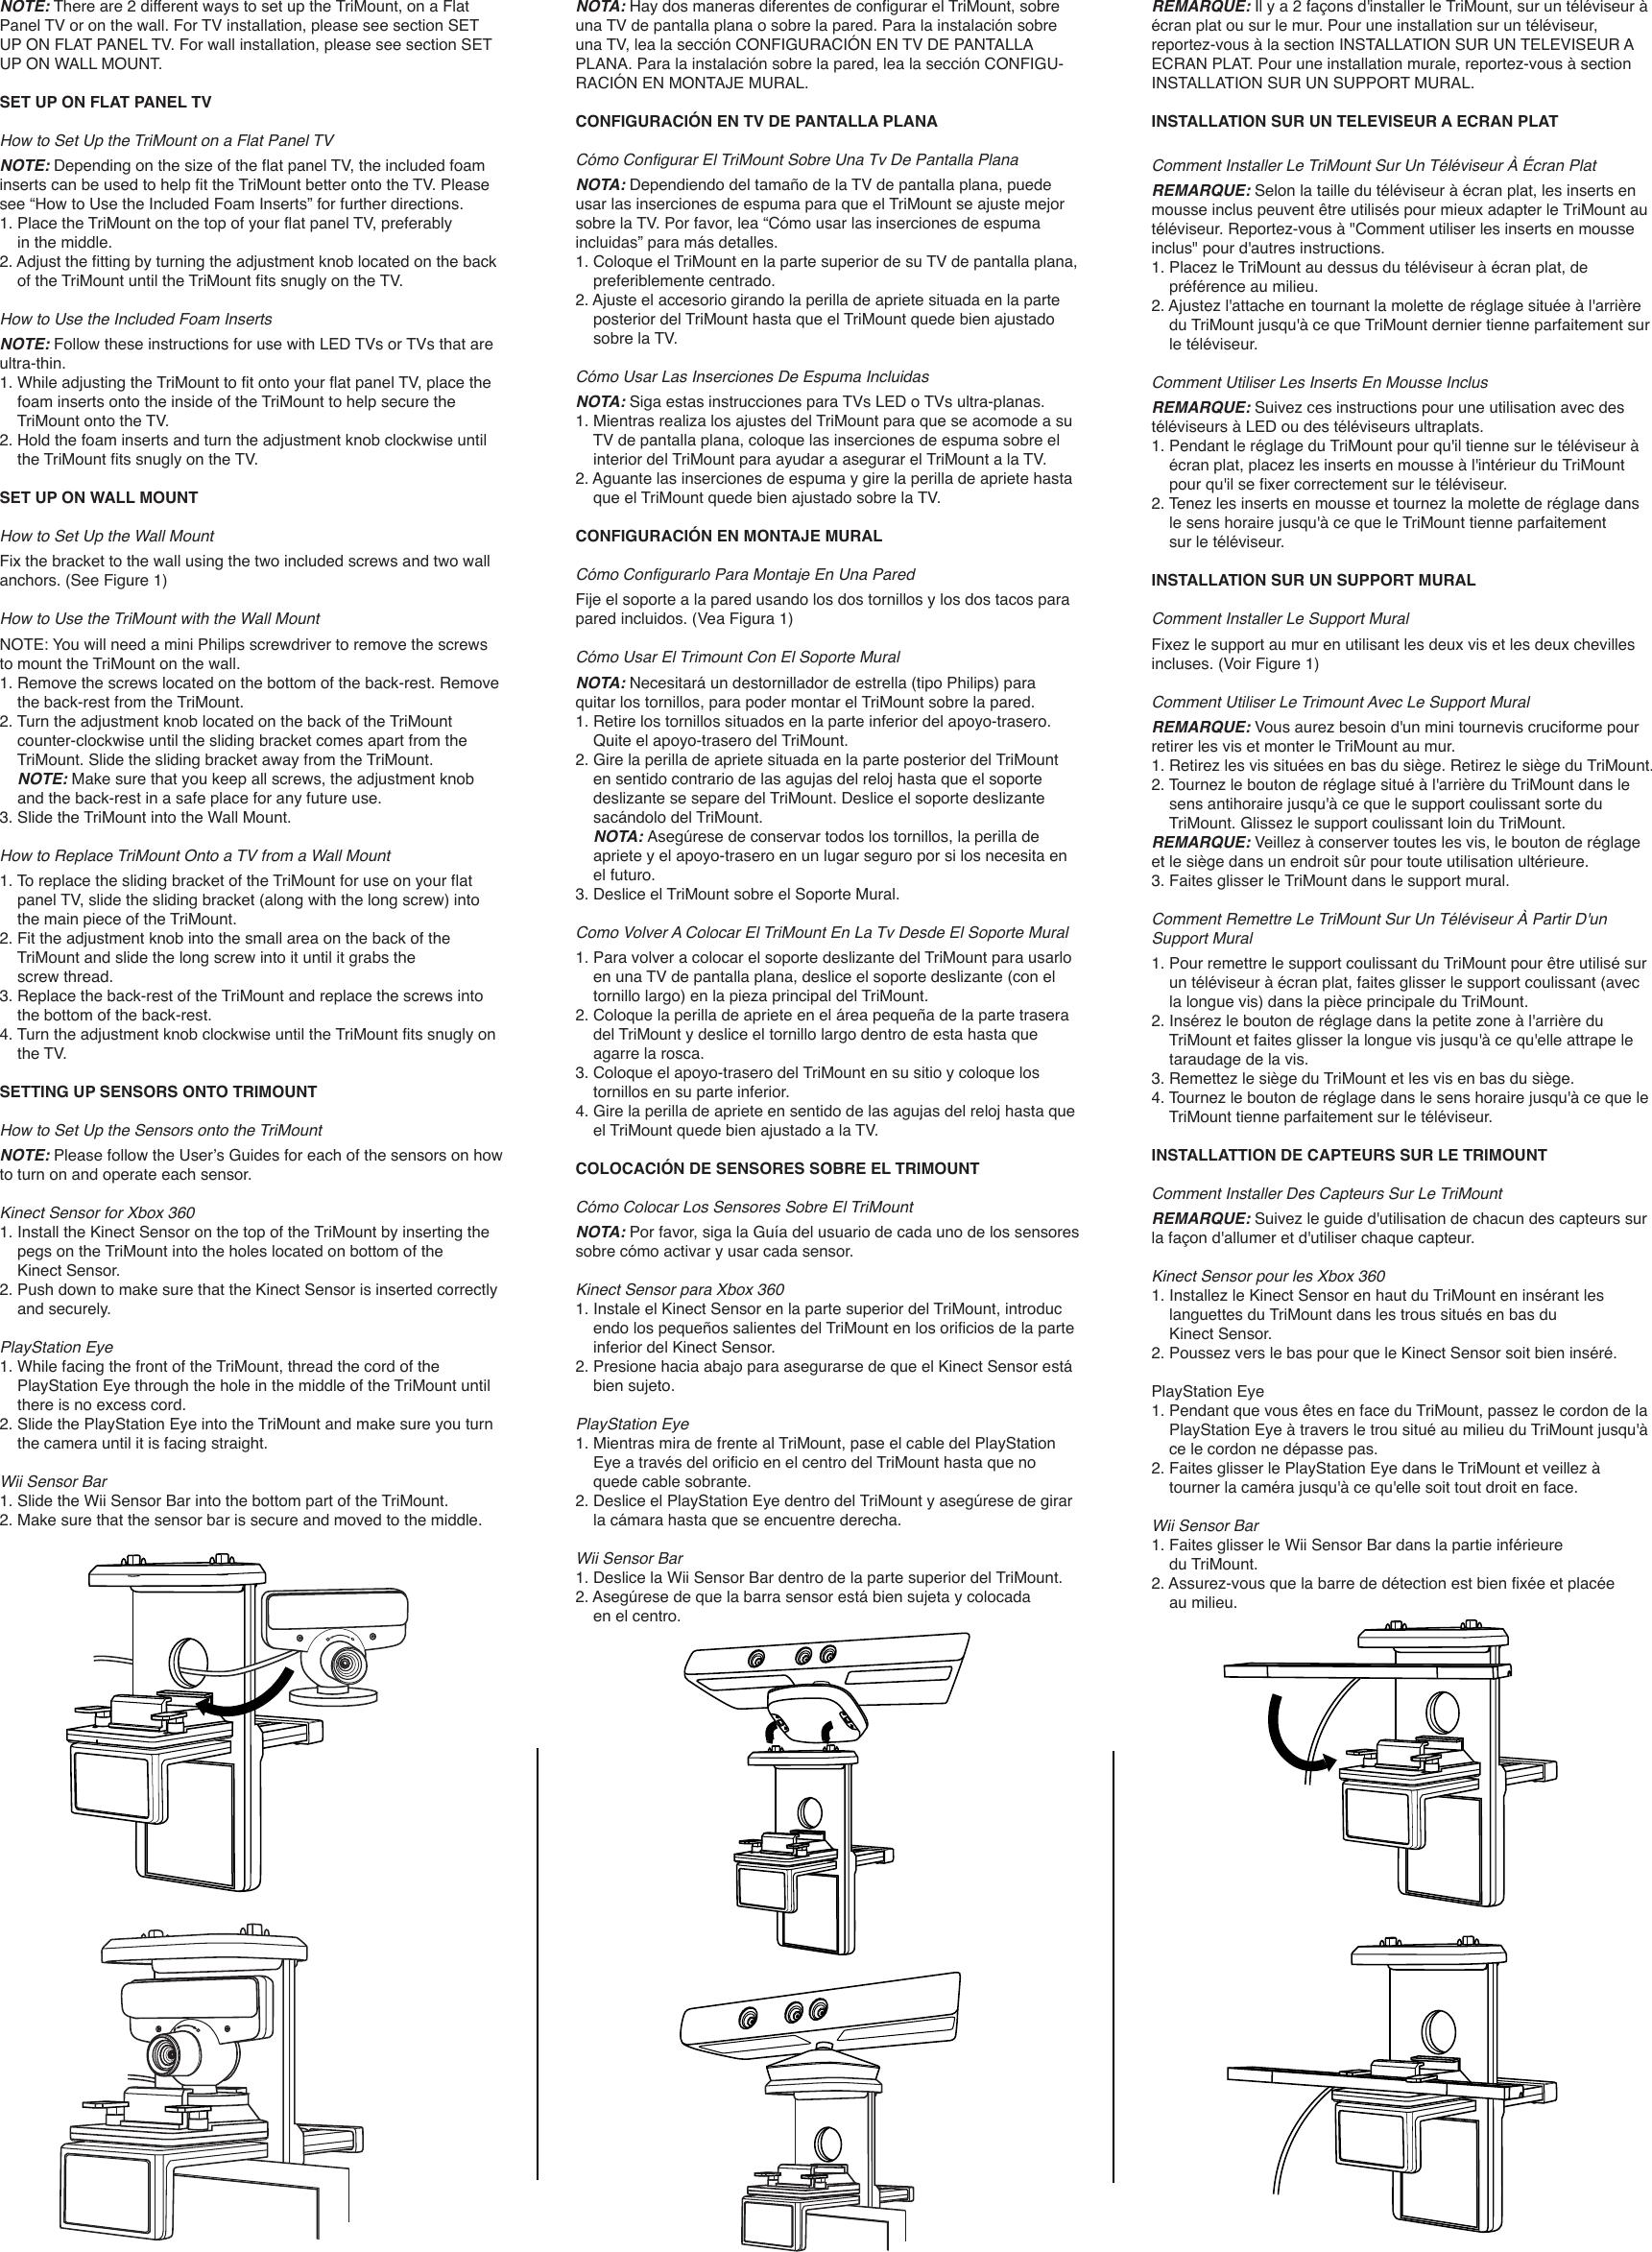 Comment Installer Tv Au Mur dreamgear tv mount dgun 2534 users manual trimount ugweb v2